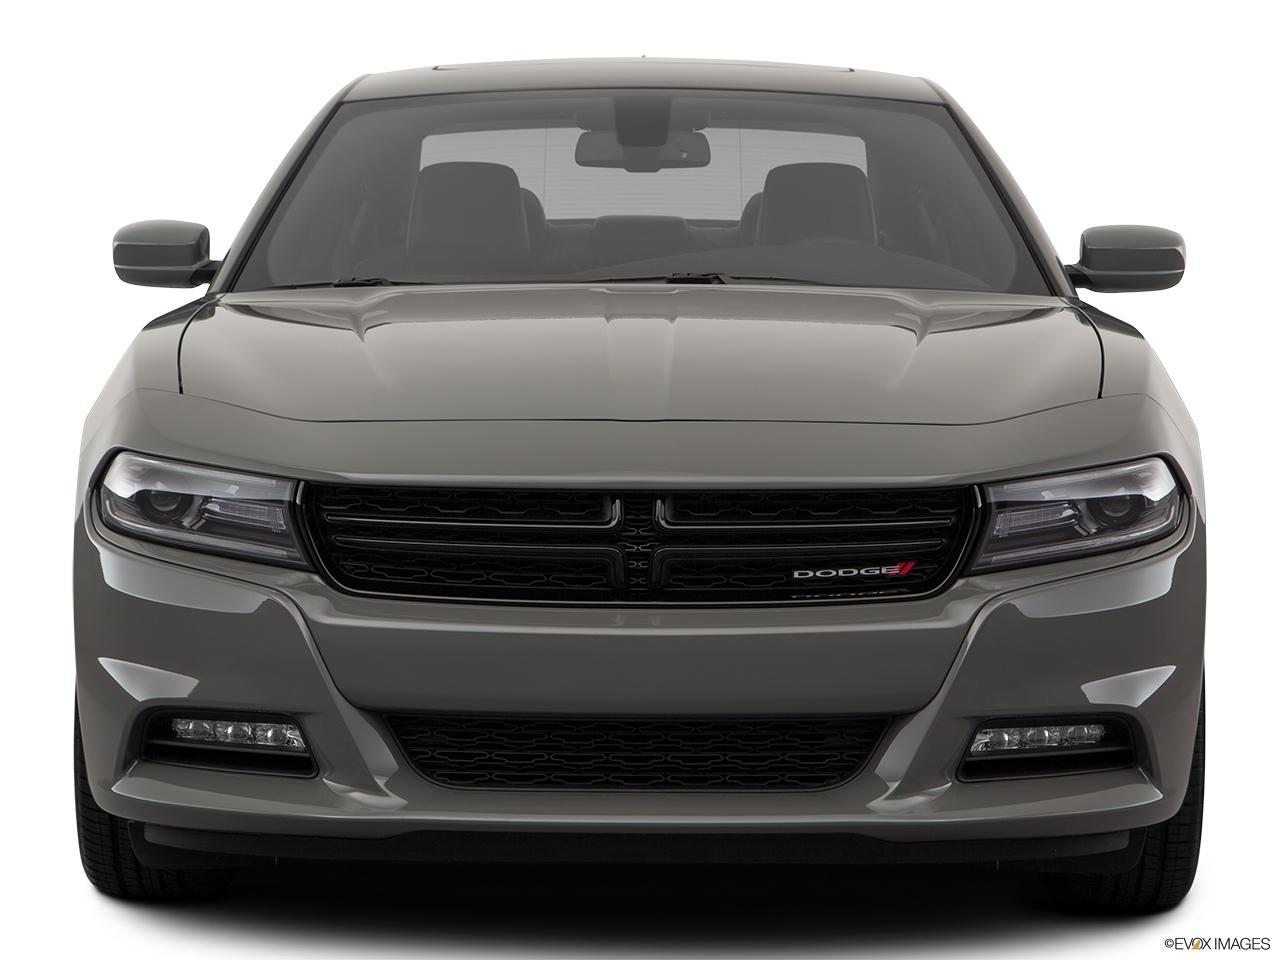 car pictures list for dodge charger 2018 3 6l sxt plus bahrain yallamotor. Black Bedroom Furniture Sets. Home Design Ideas